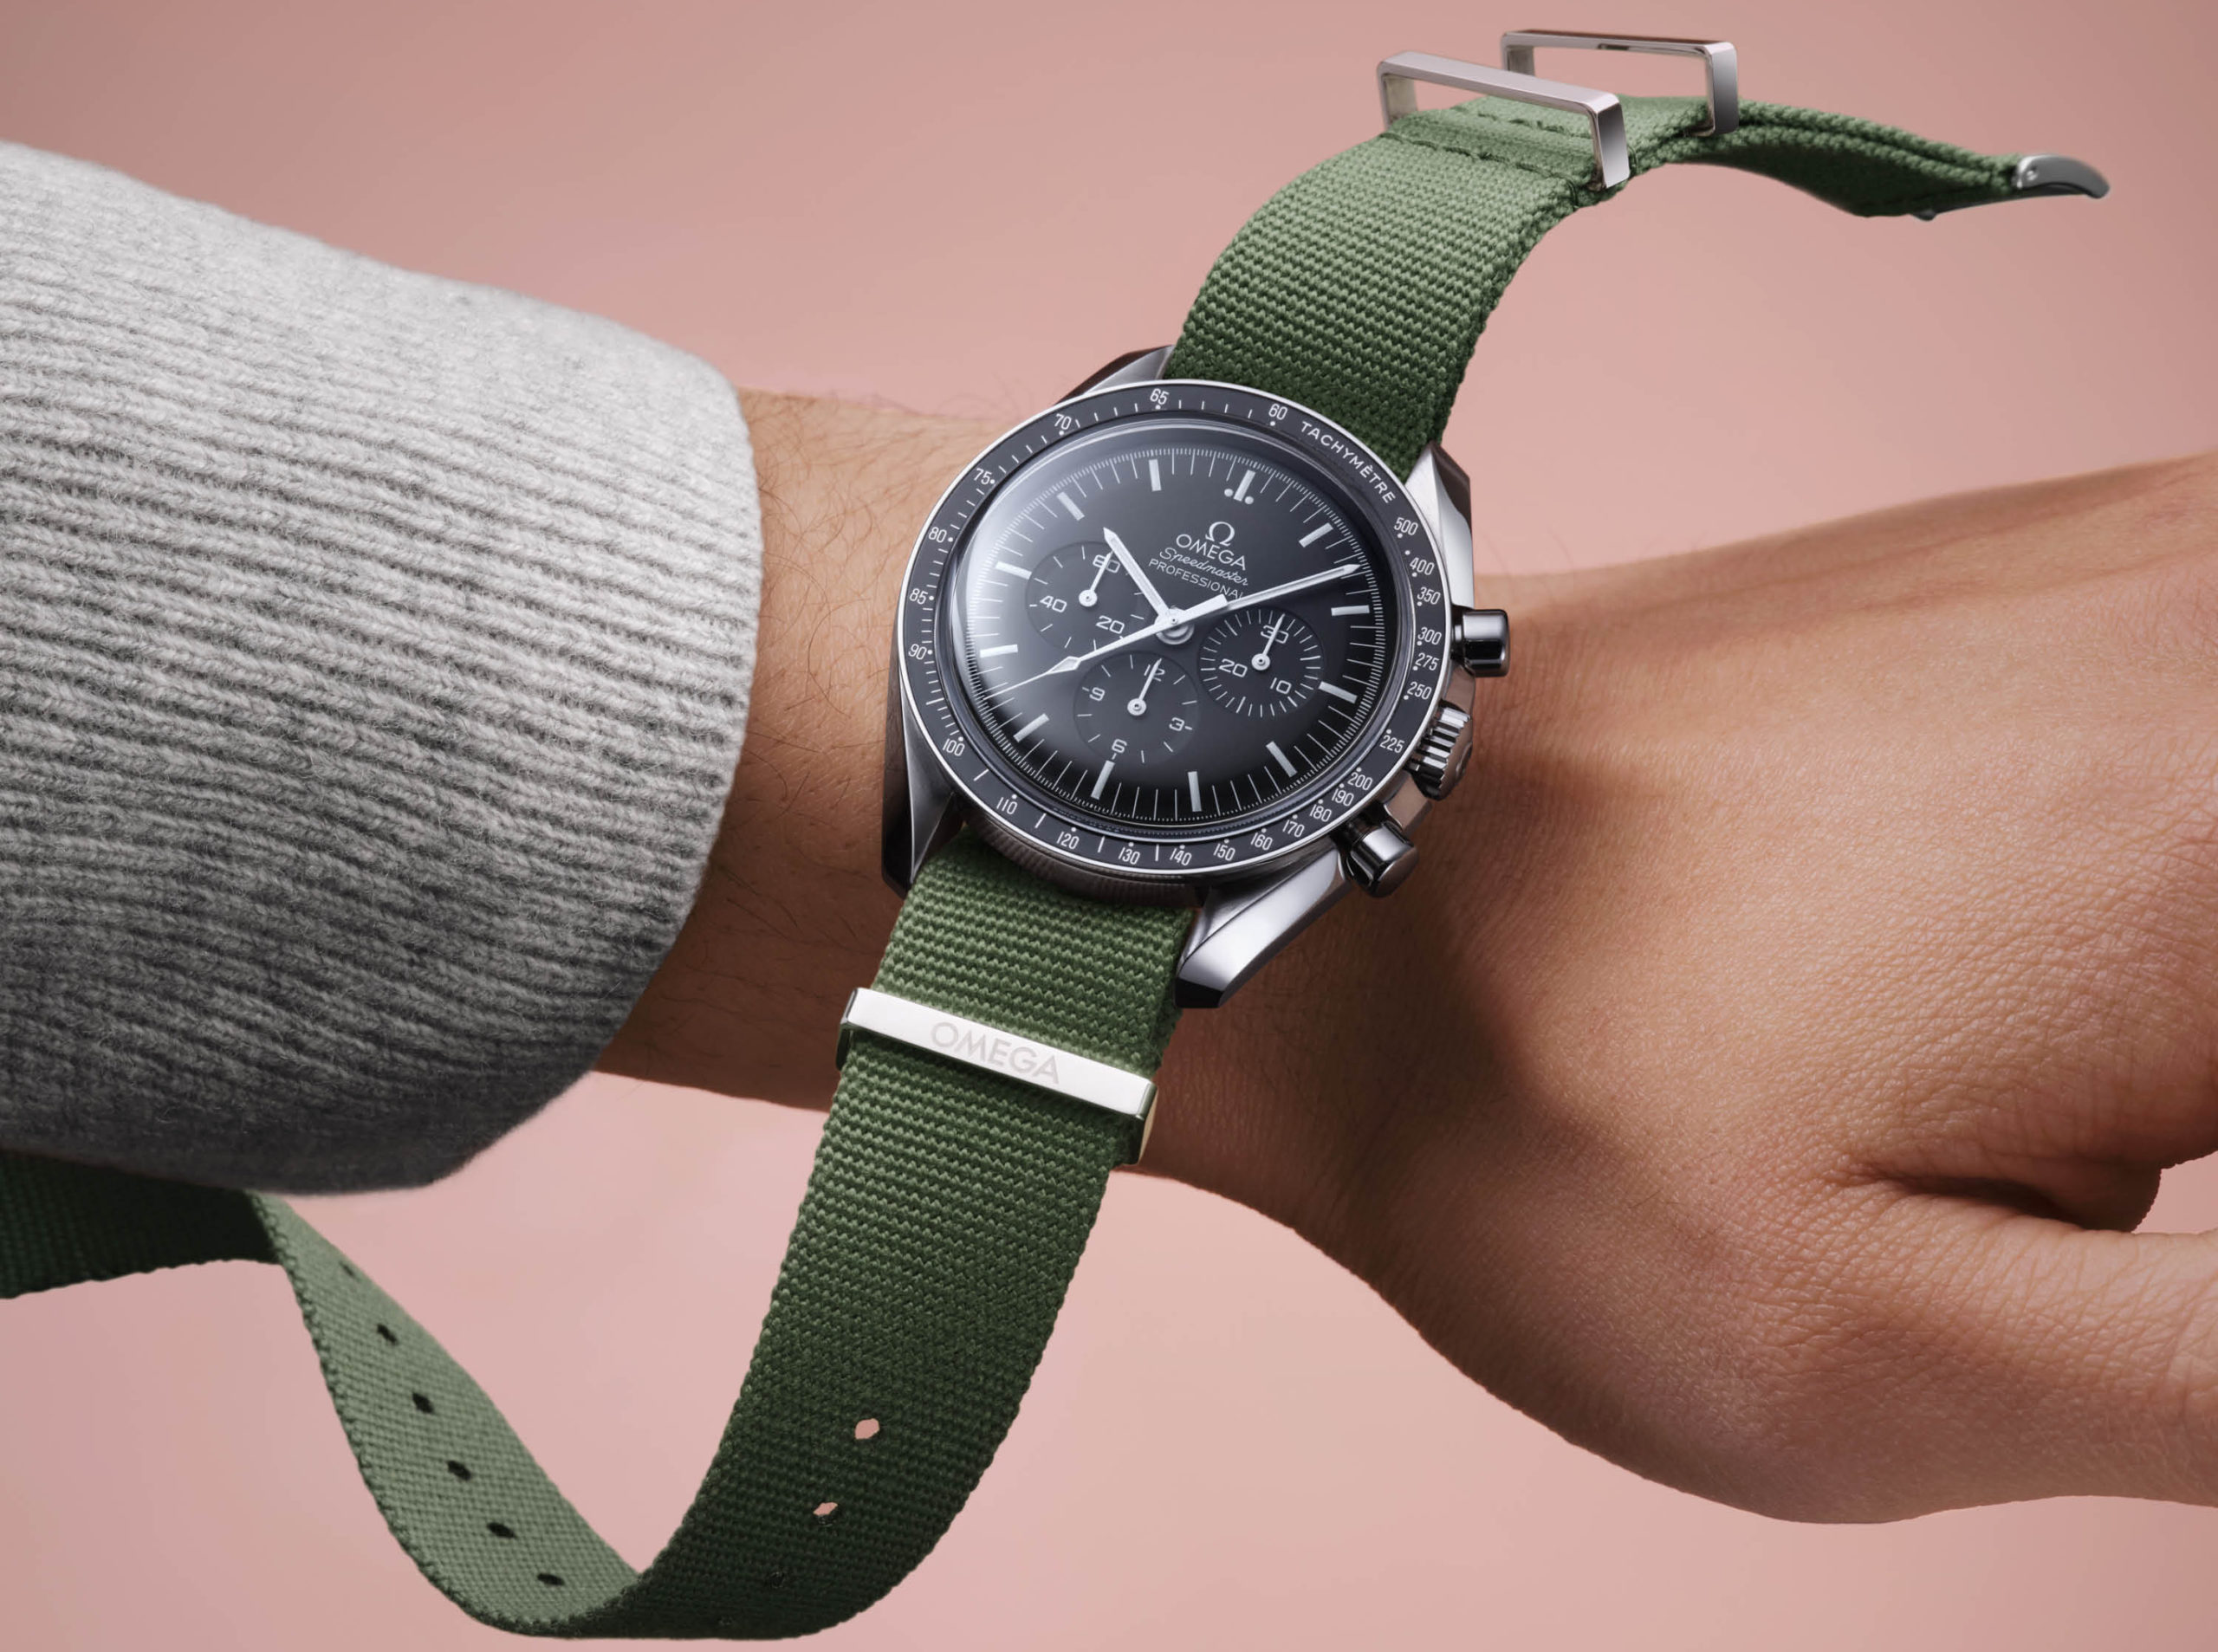 Omega Watch New NATO Green Watch Strap